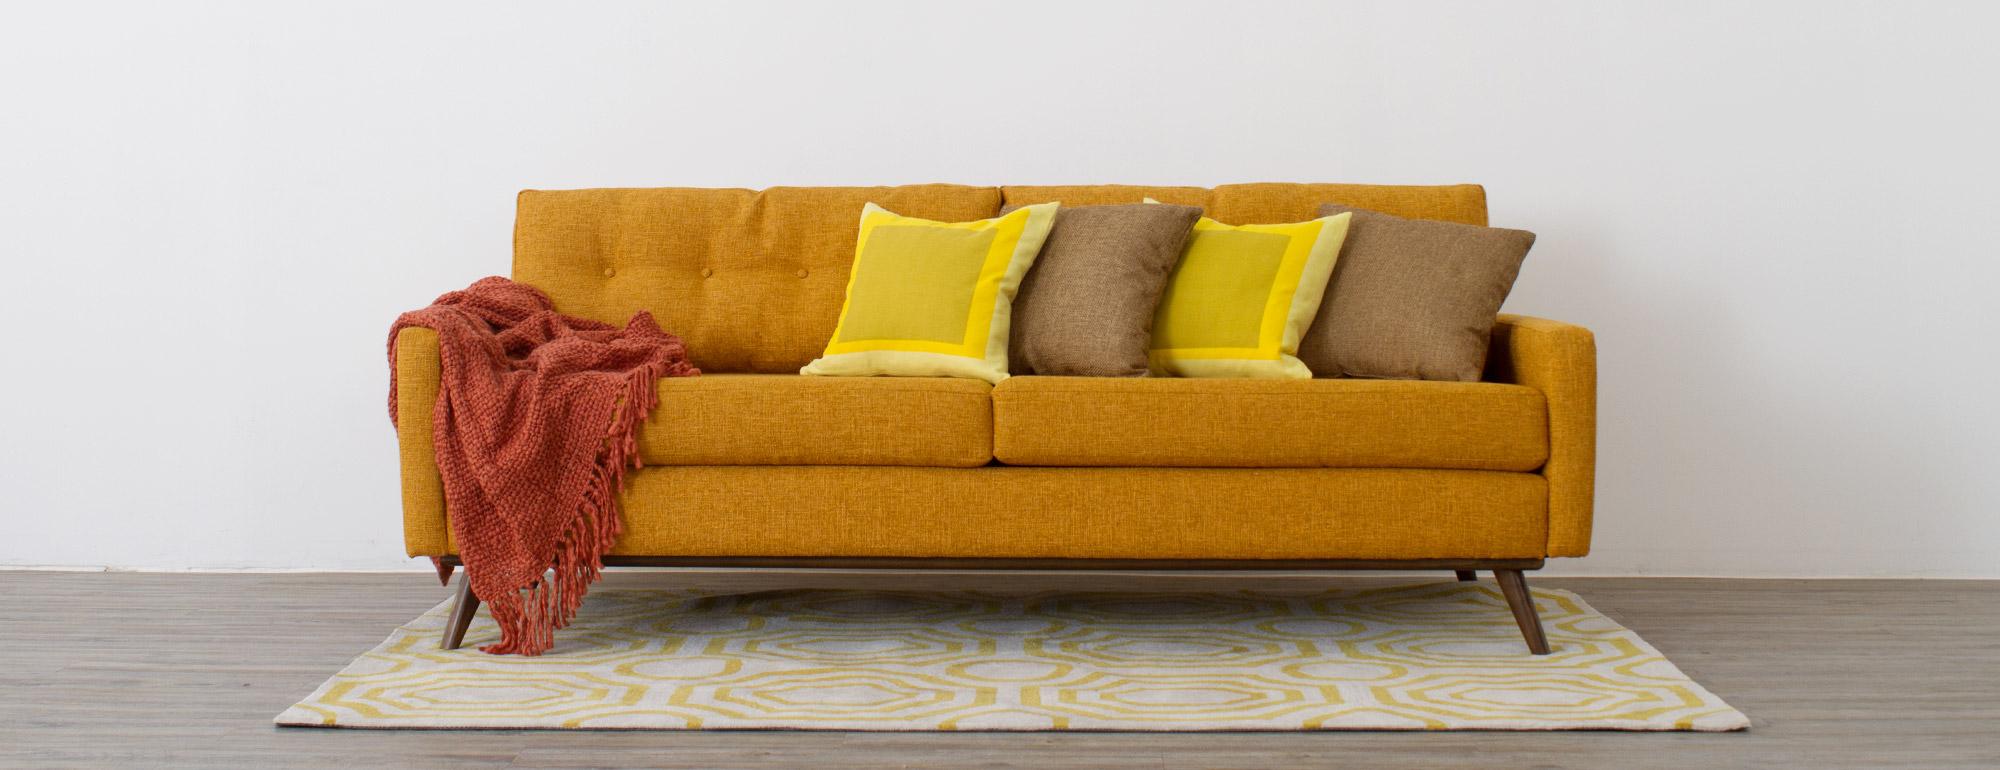 hero-hopson-sofa-8